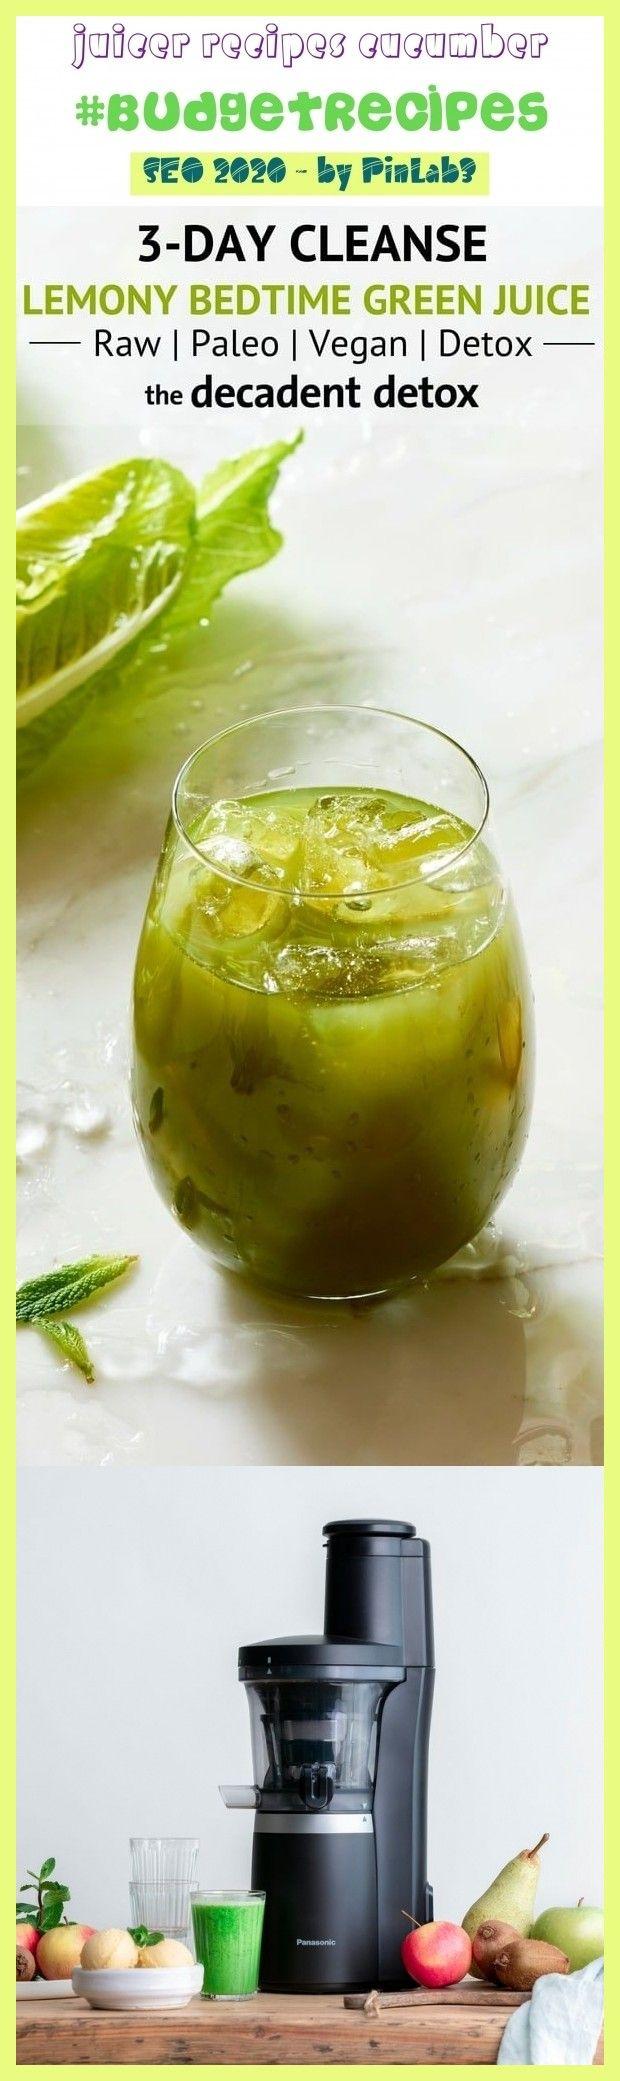 Juicer Recipes Cucumber Juicer Recipes Cucumber Saftpresse Rezepte Gurke Recettes Presse Juicer Recipes Juice Cleanse Recipes Diy Juice Cleanse Recipes